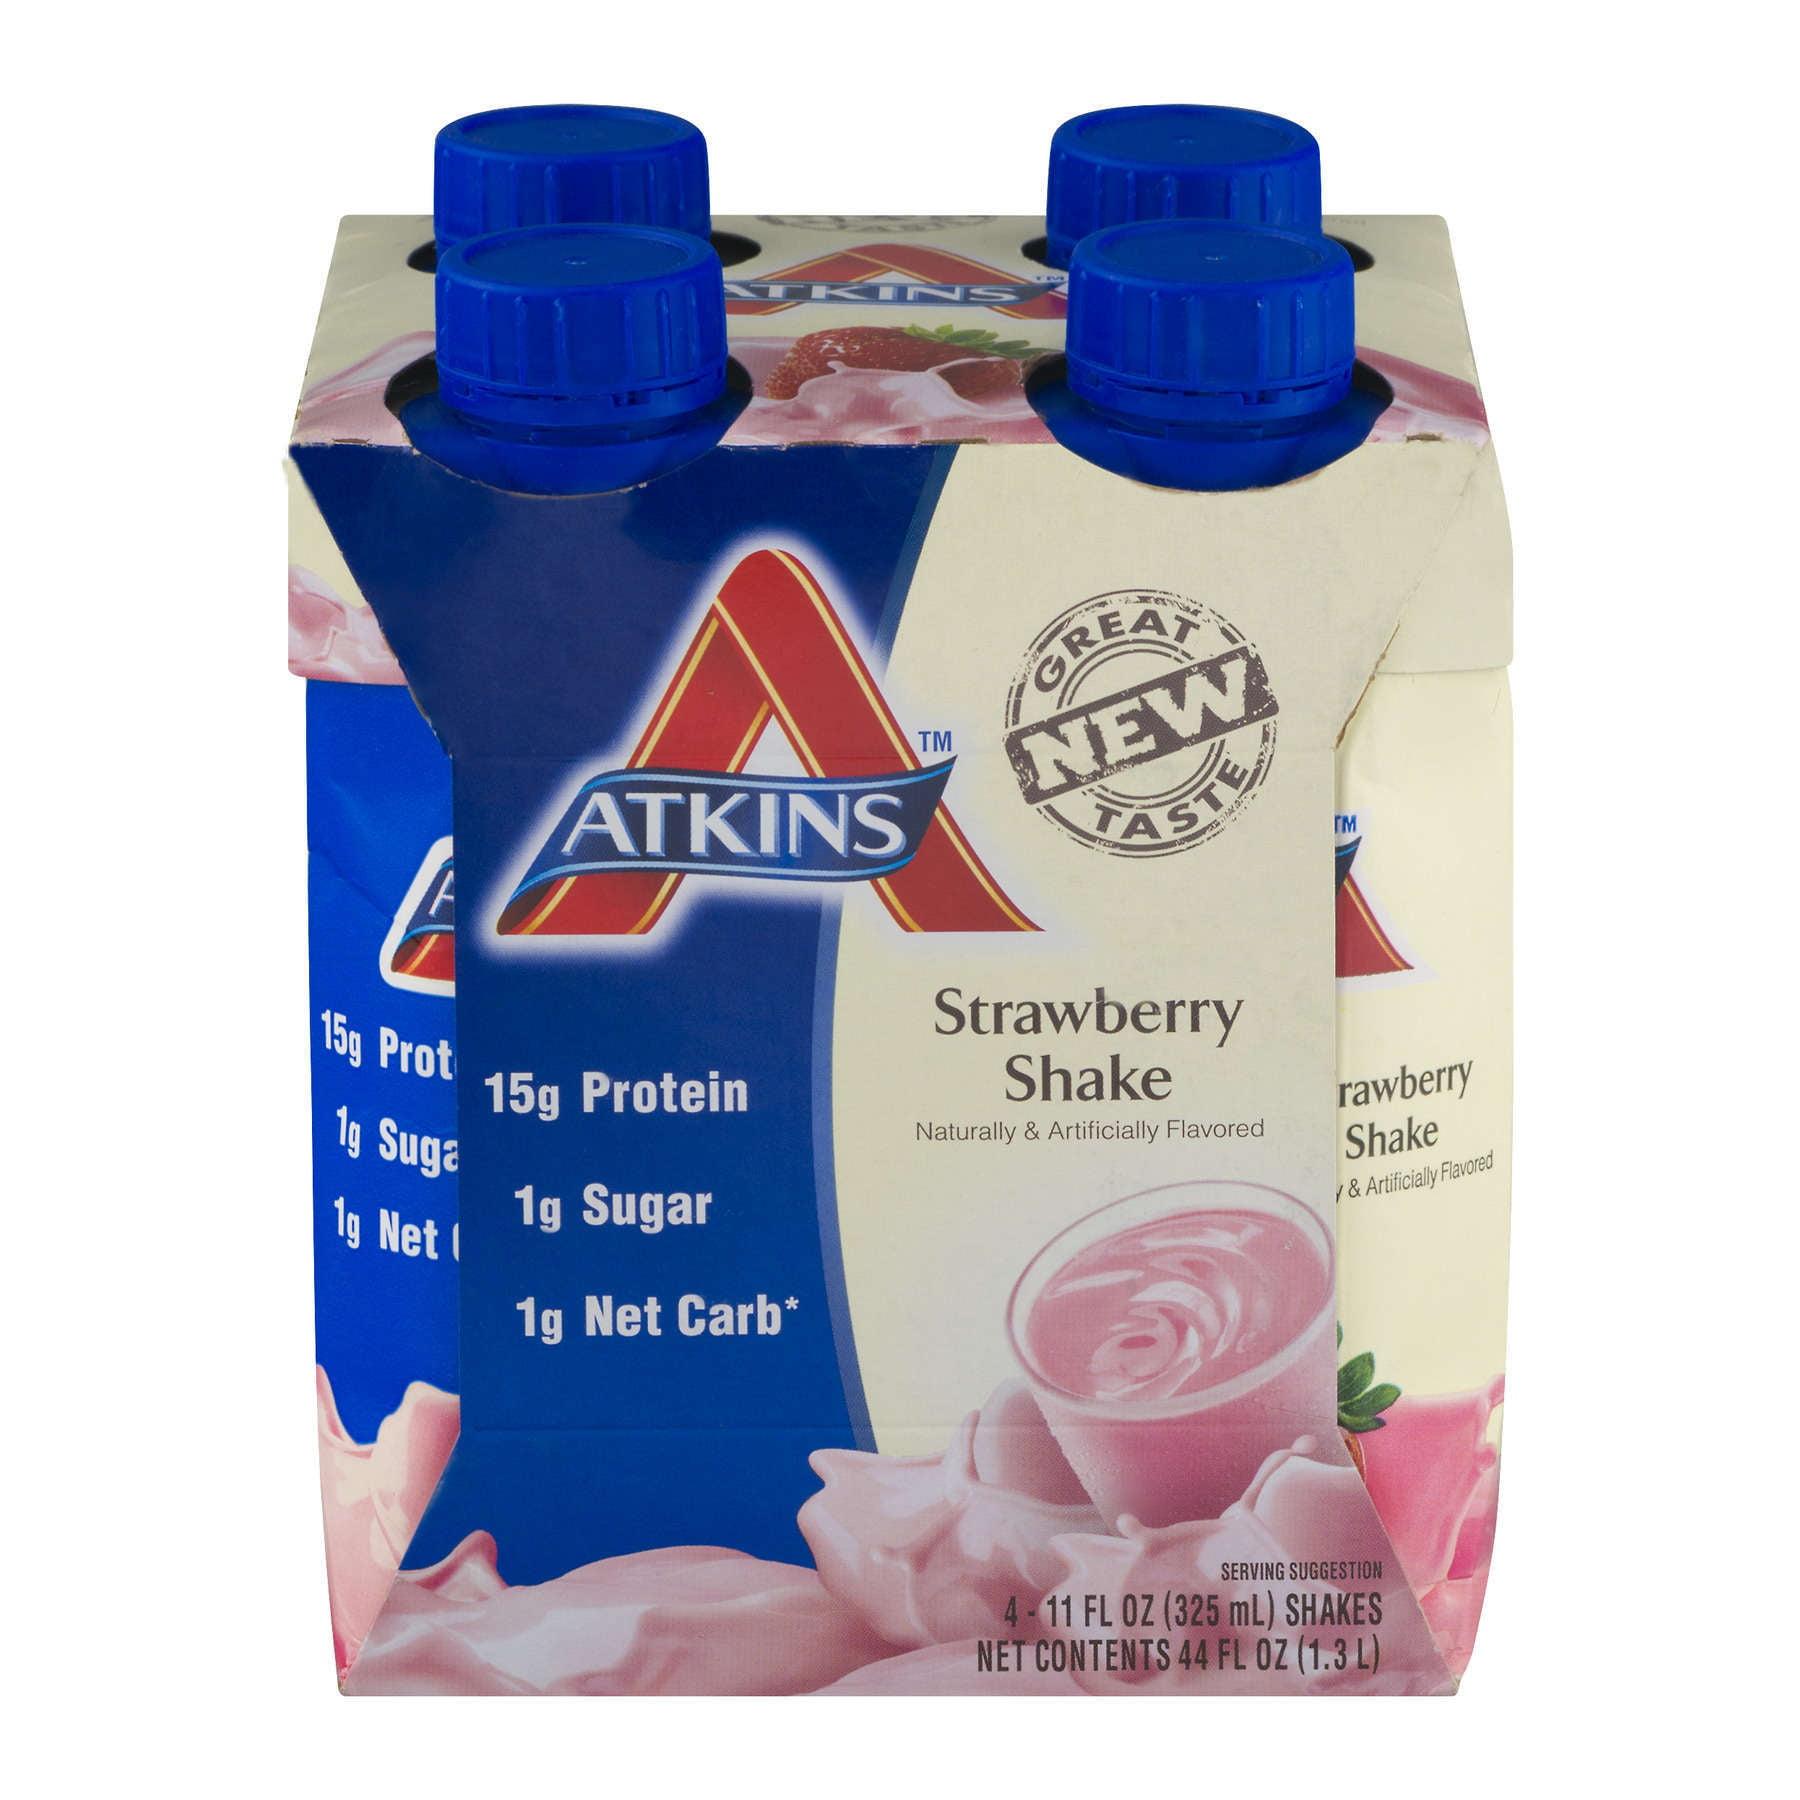 Atkins Strawberry Shake, 11Fl oz, 4-pack (Ready To Drink)